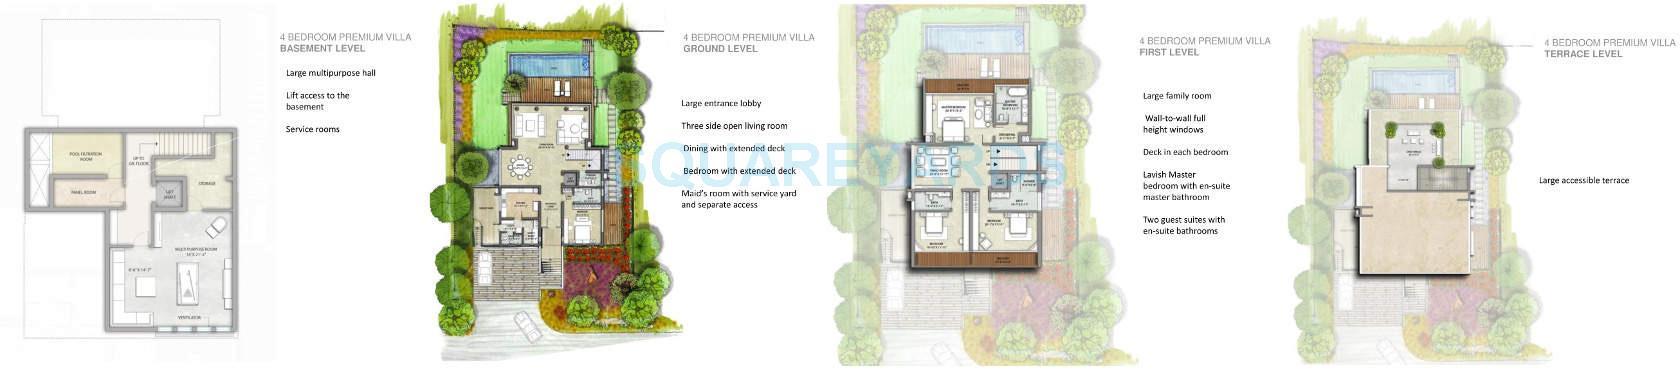 kalpataru amoda reserve villa 4bhk 4315sqft1